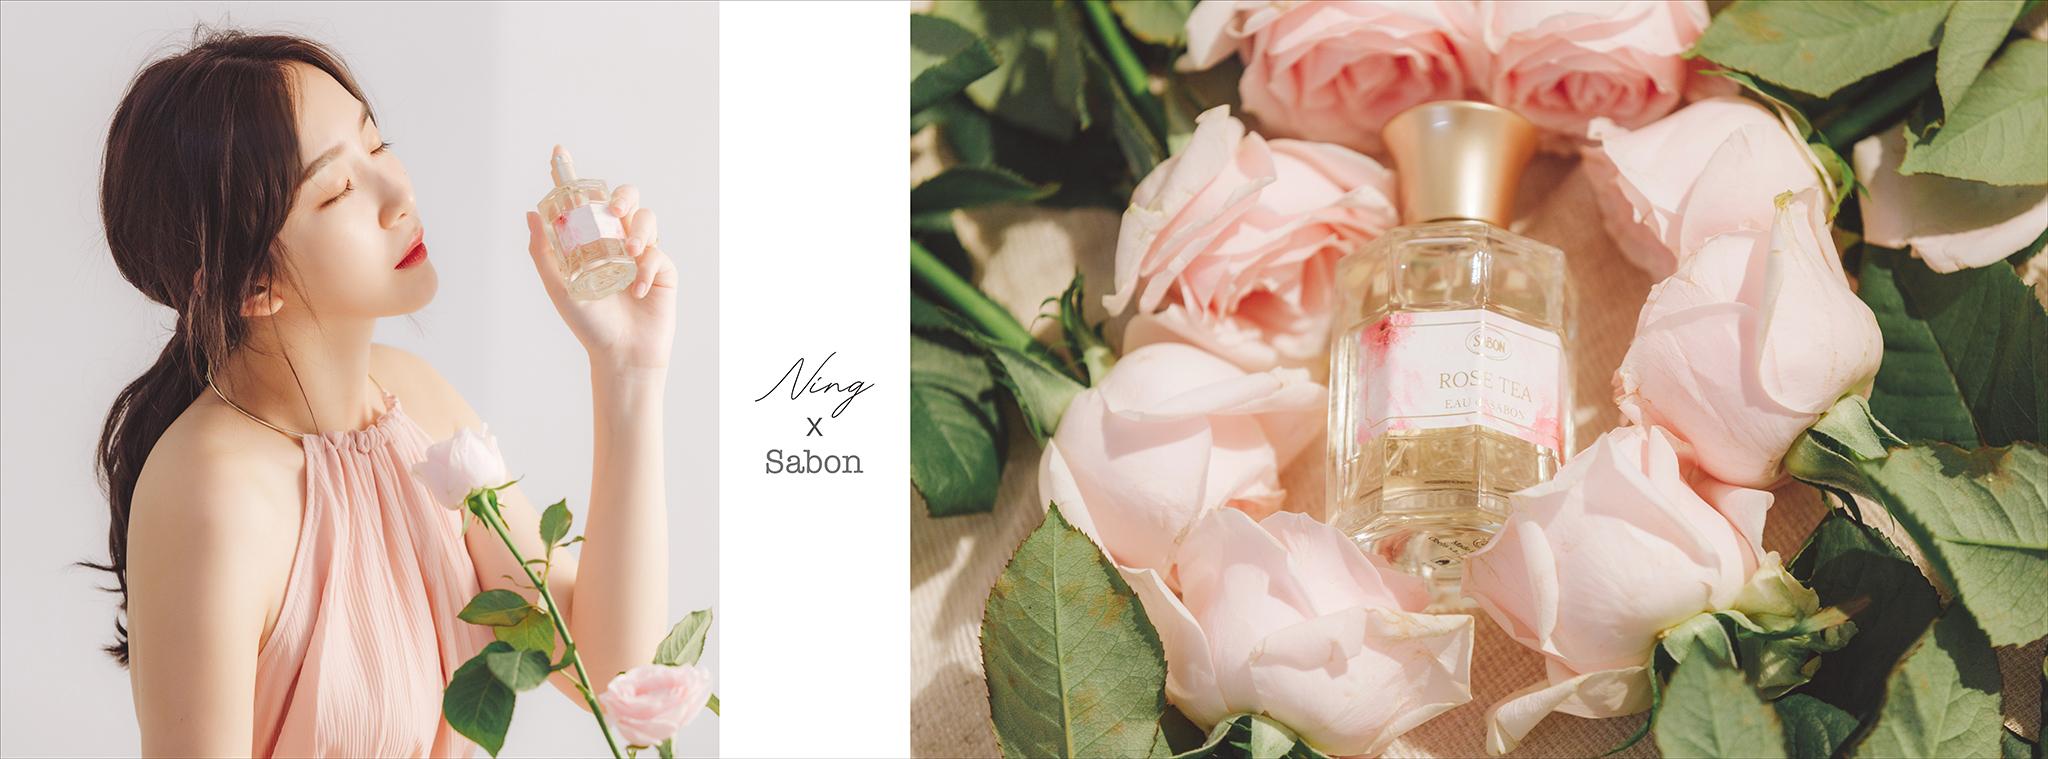 49951095361 bb50130a01 o - 【聯名形象】+Ning & Sabon+